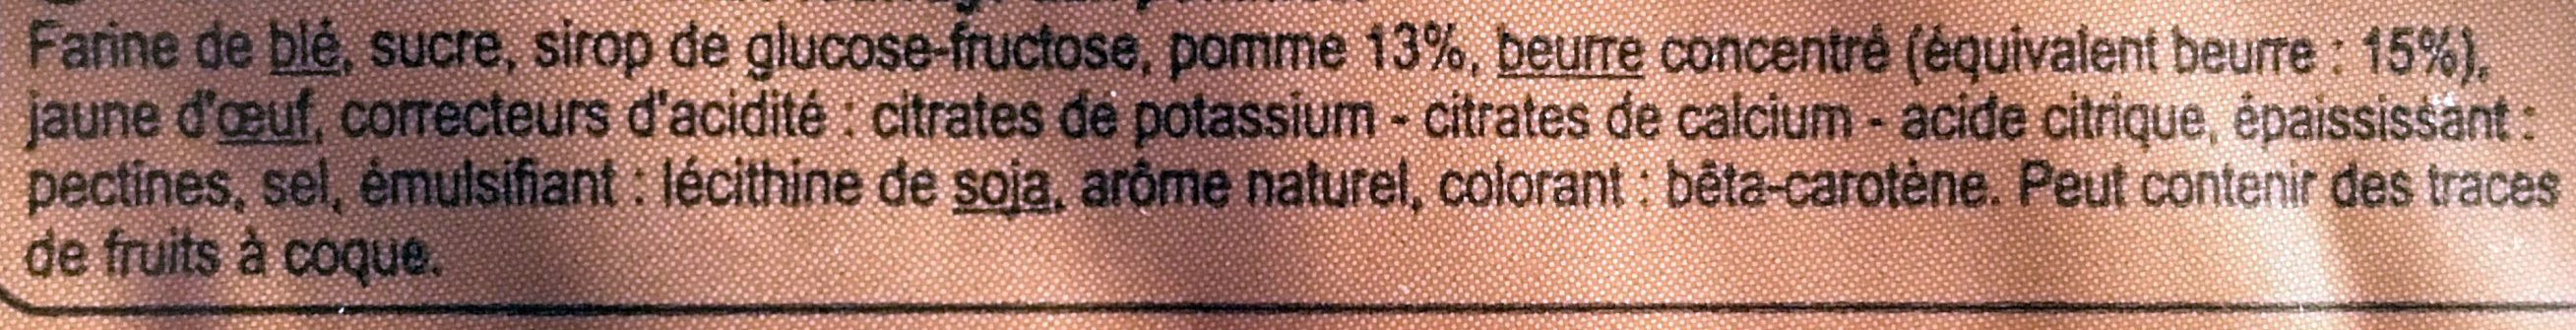 Tartelletes aux pommes - Ingrediënten - fr